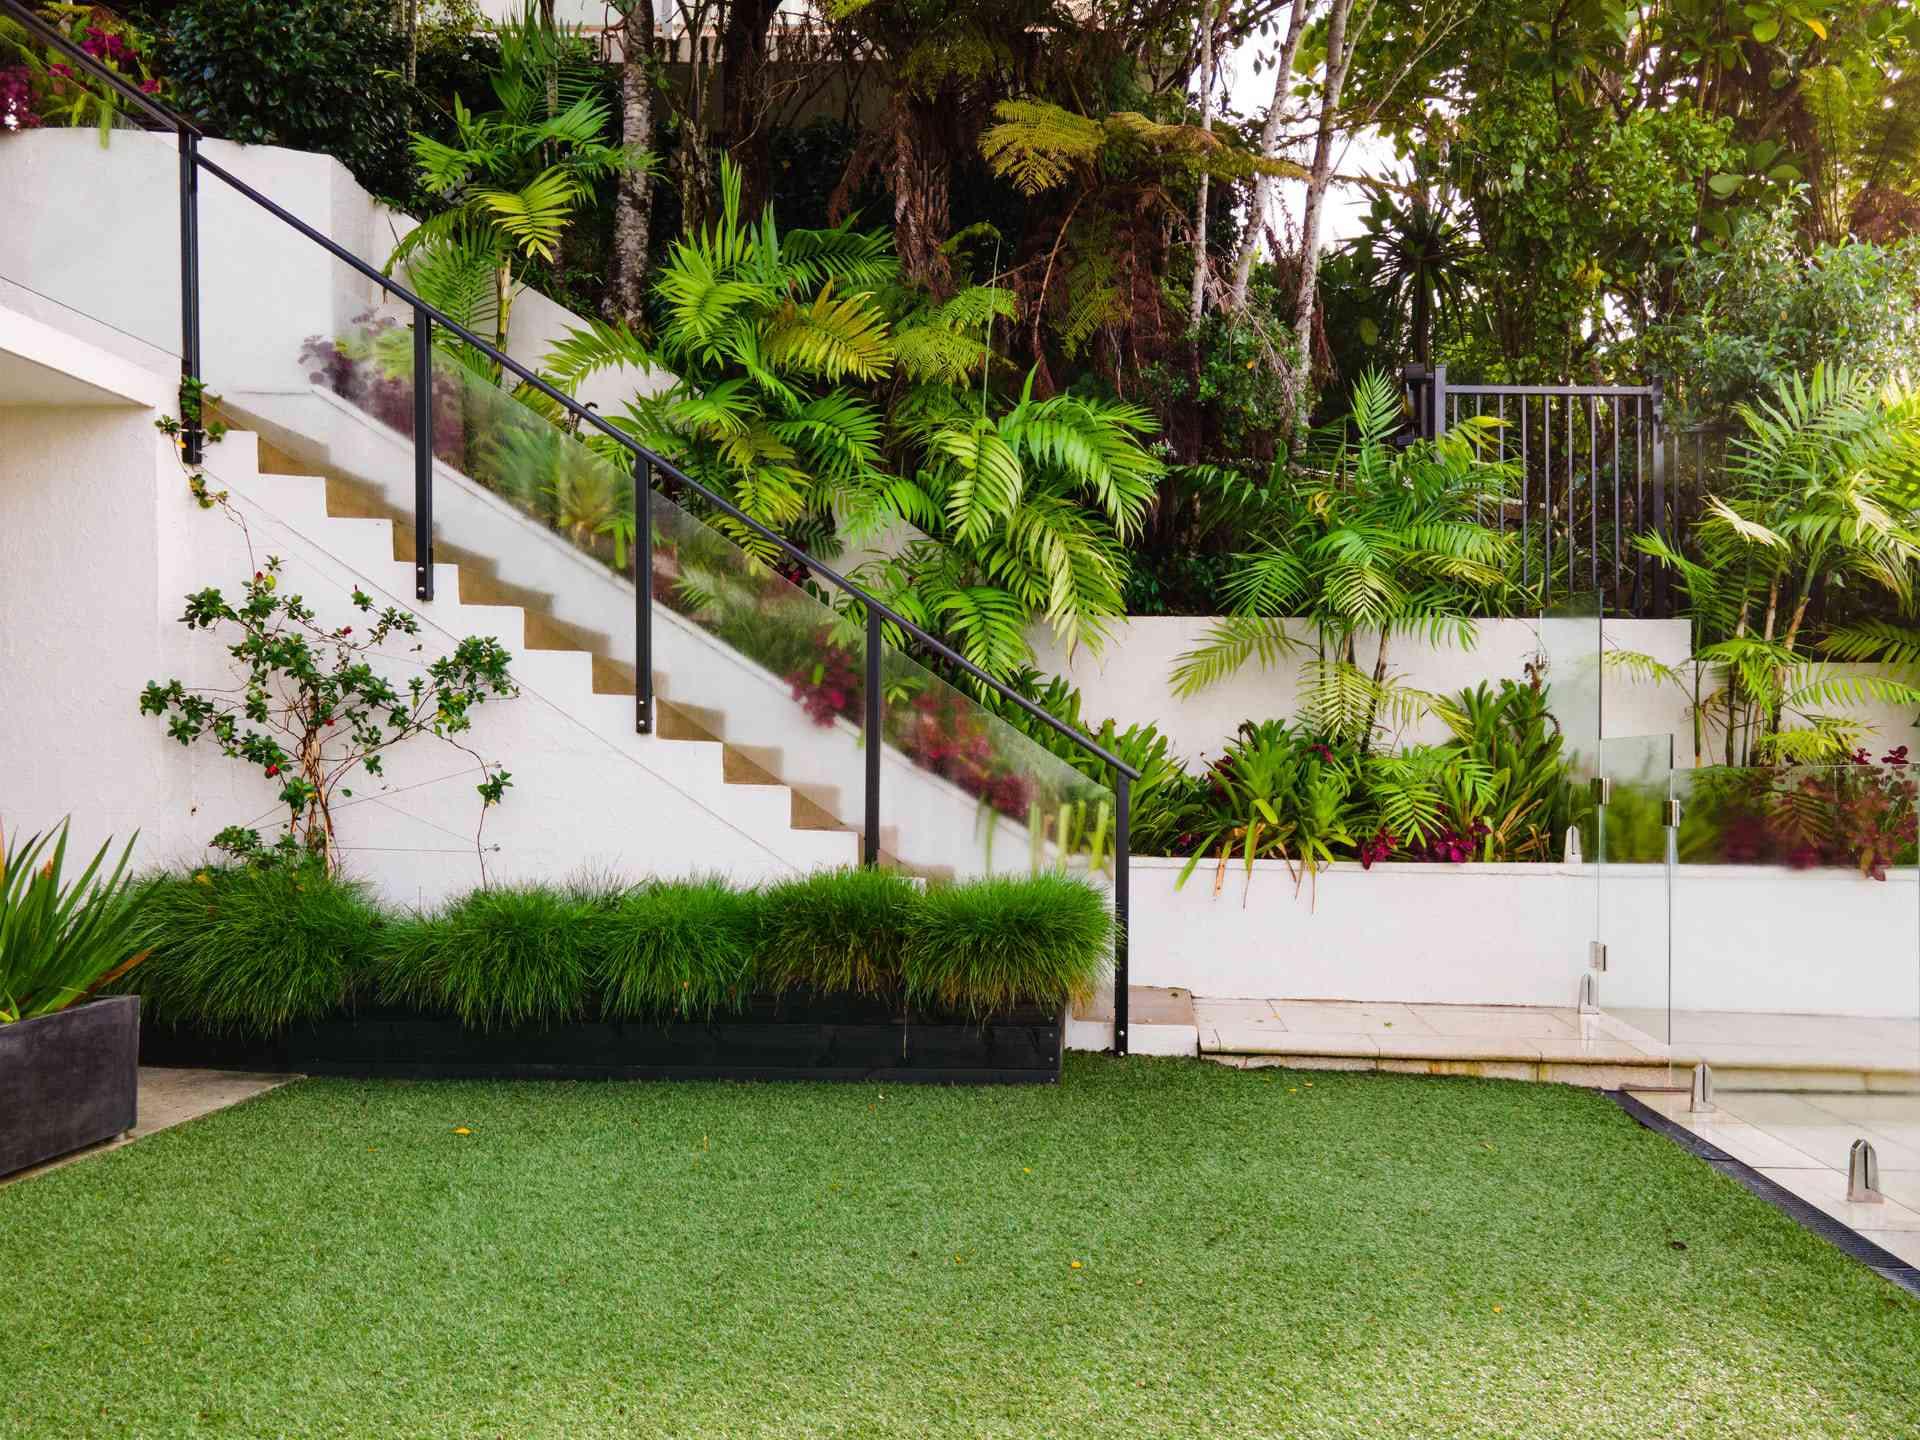 Garden with poured concrete retaining walls